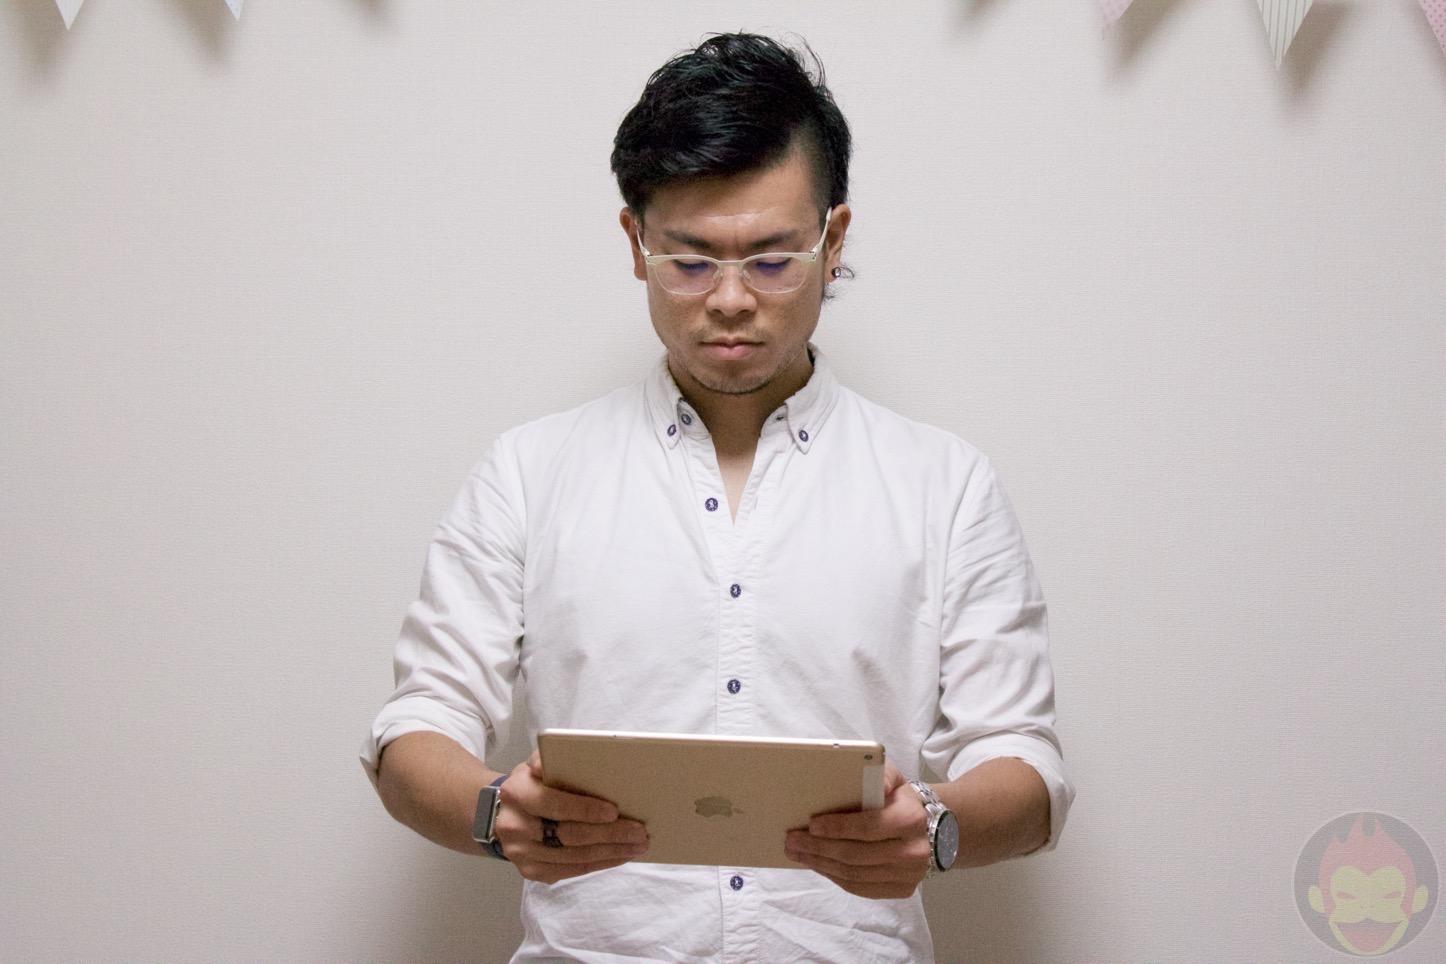 iPad-Pro-Air2-mini2-Comparison-003.jpg